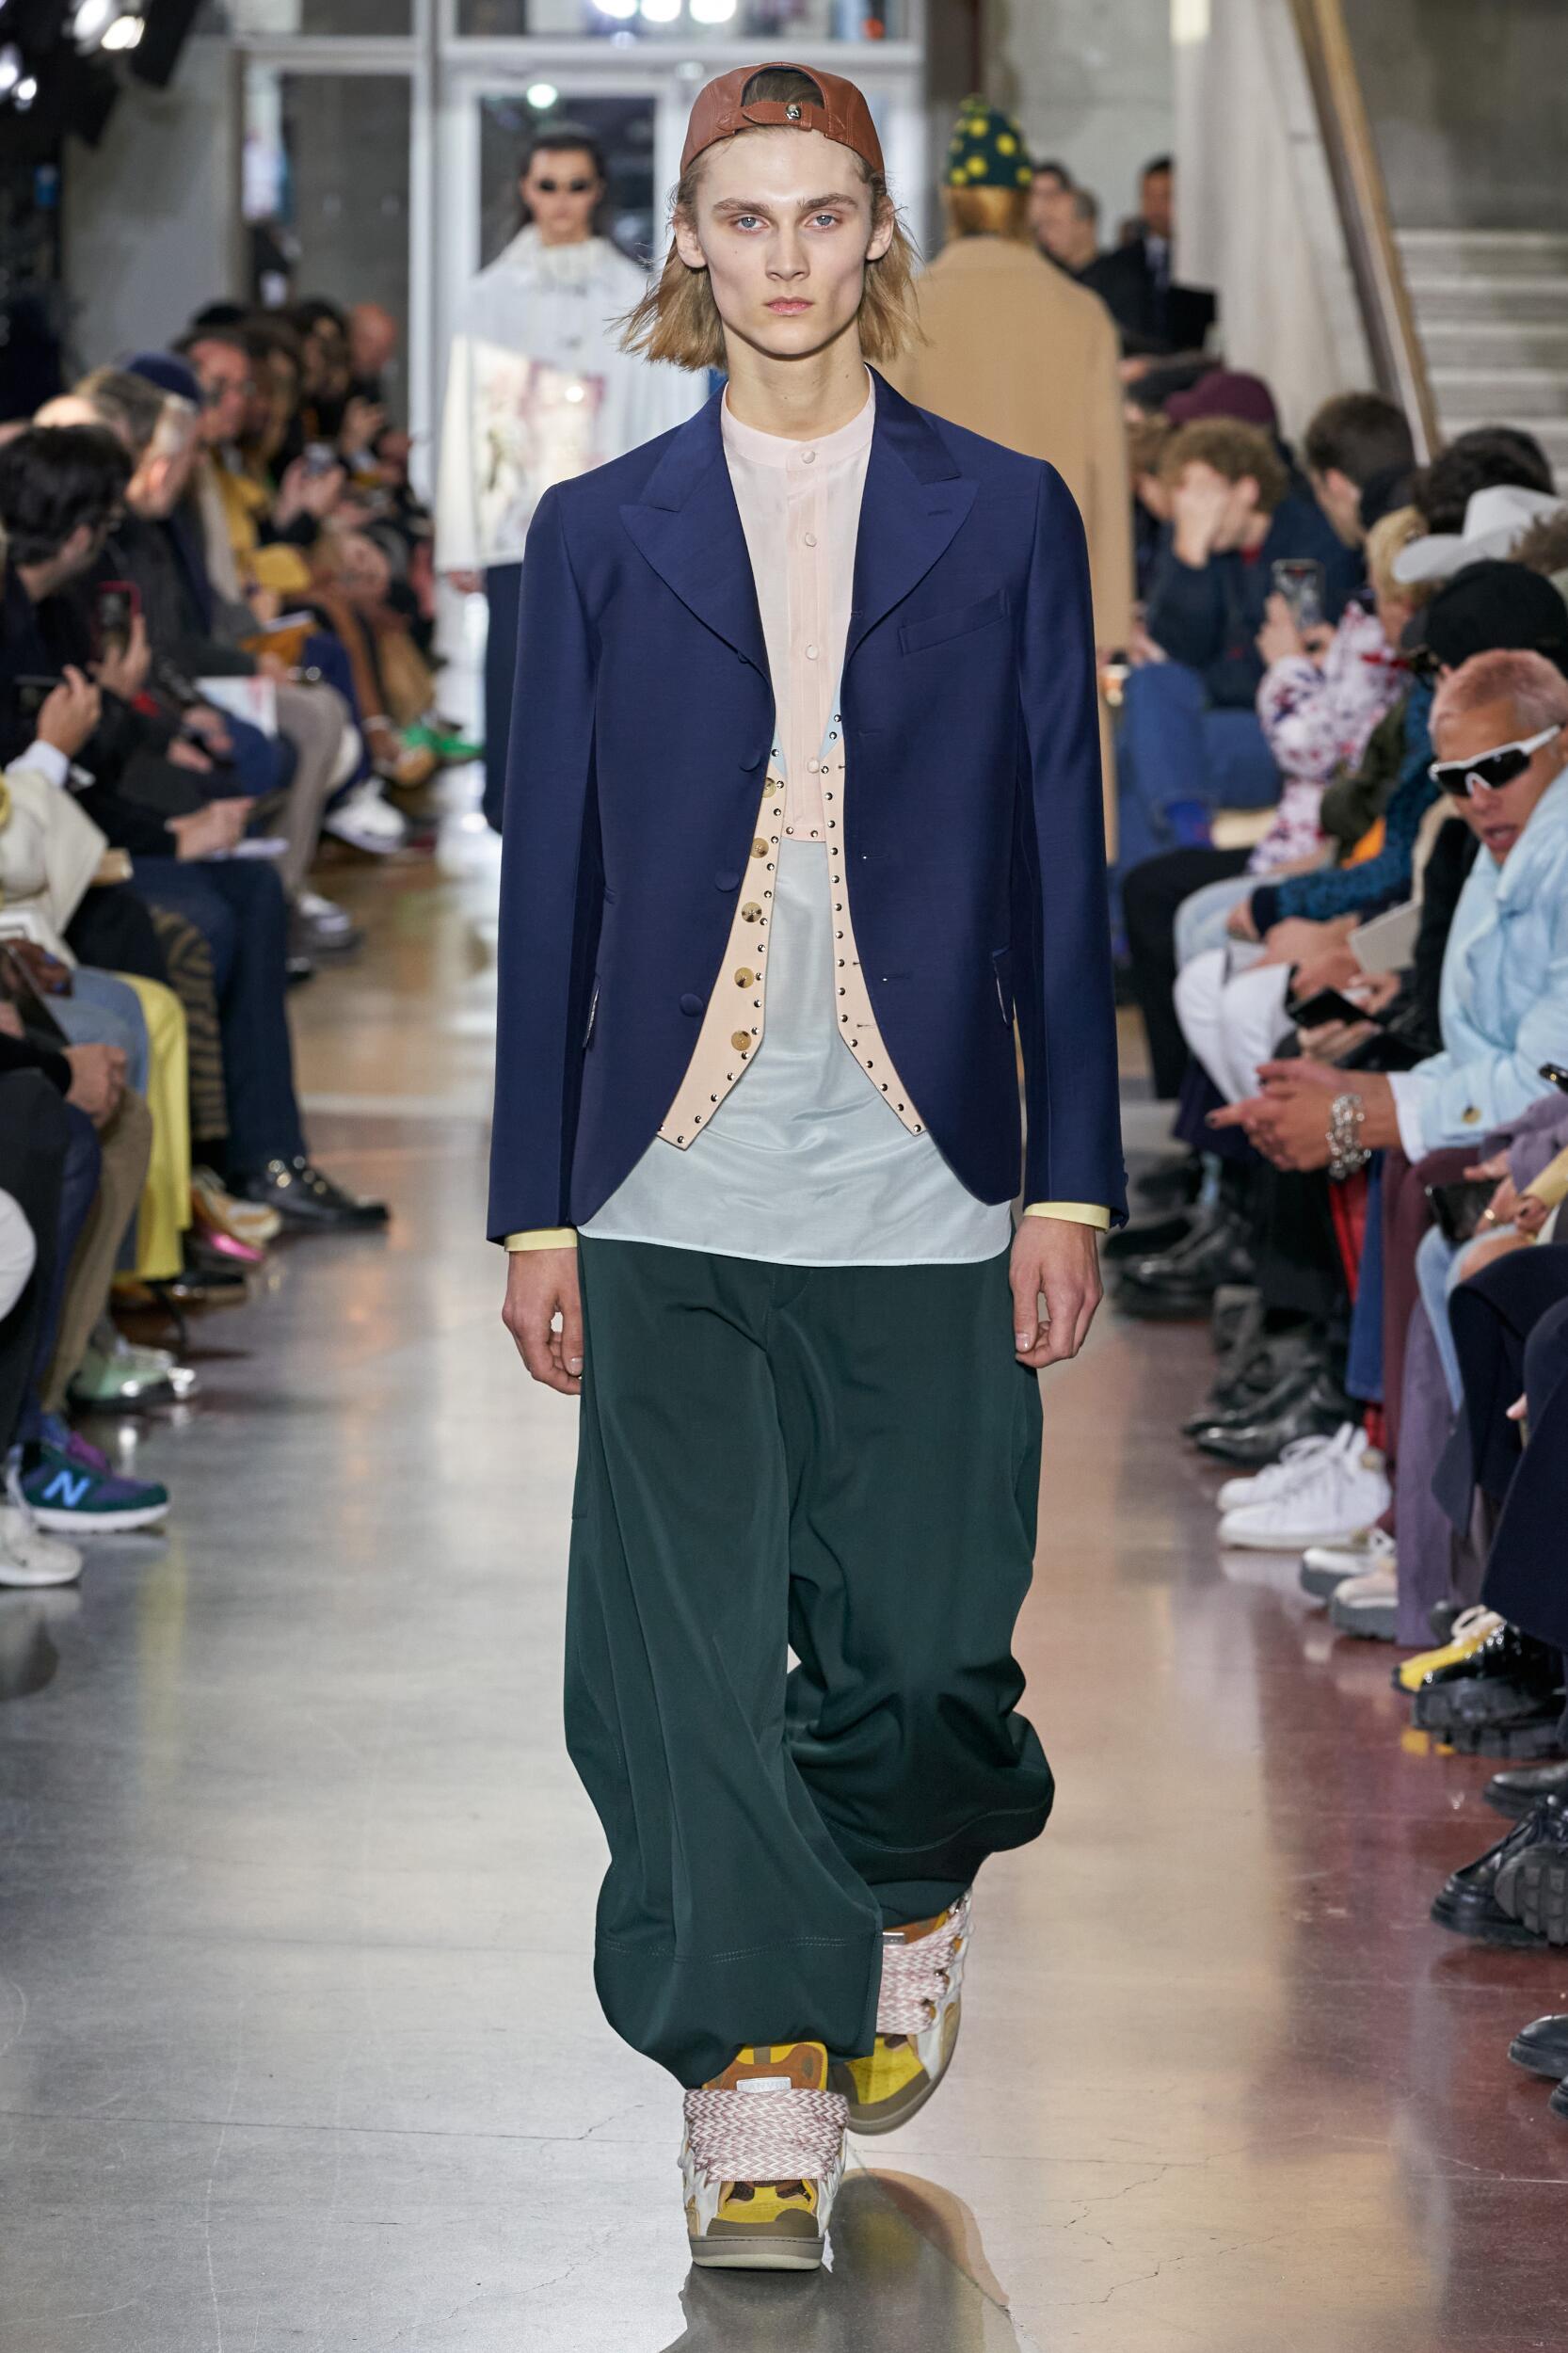 Fashion Show Man Model Lanvin Catwalk